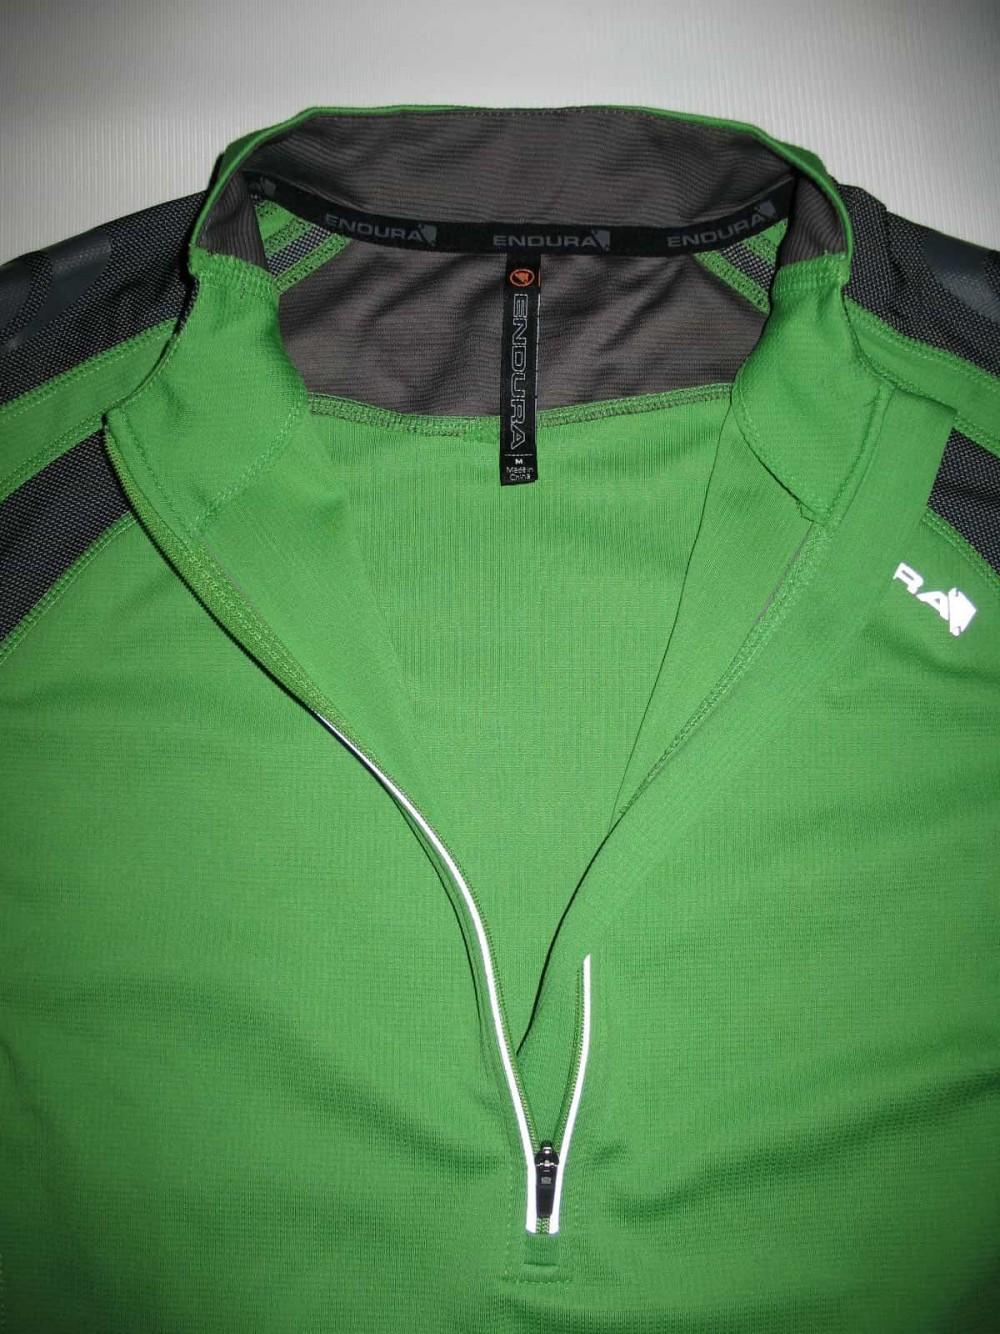 Веломайка ENDURA hummvee ss jersey (размер M/L) - 3